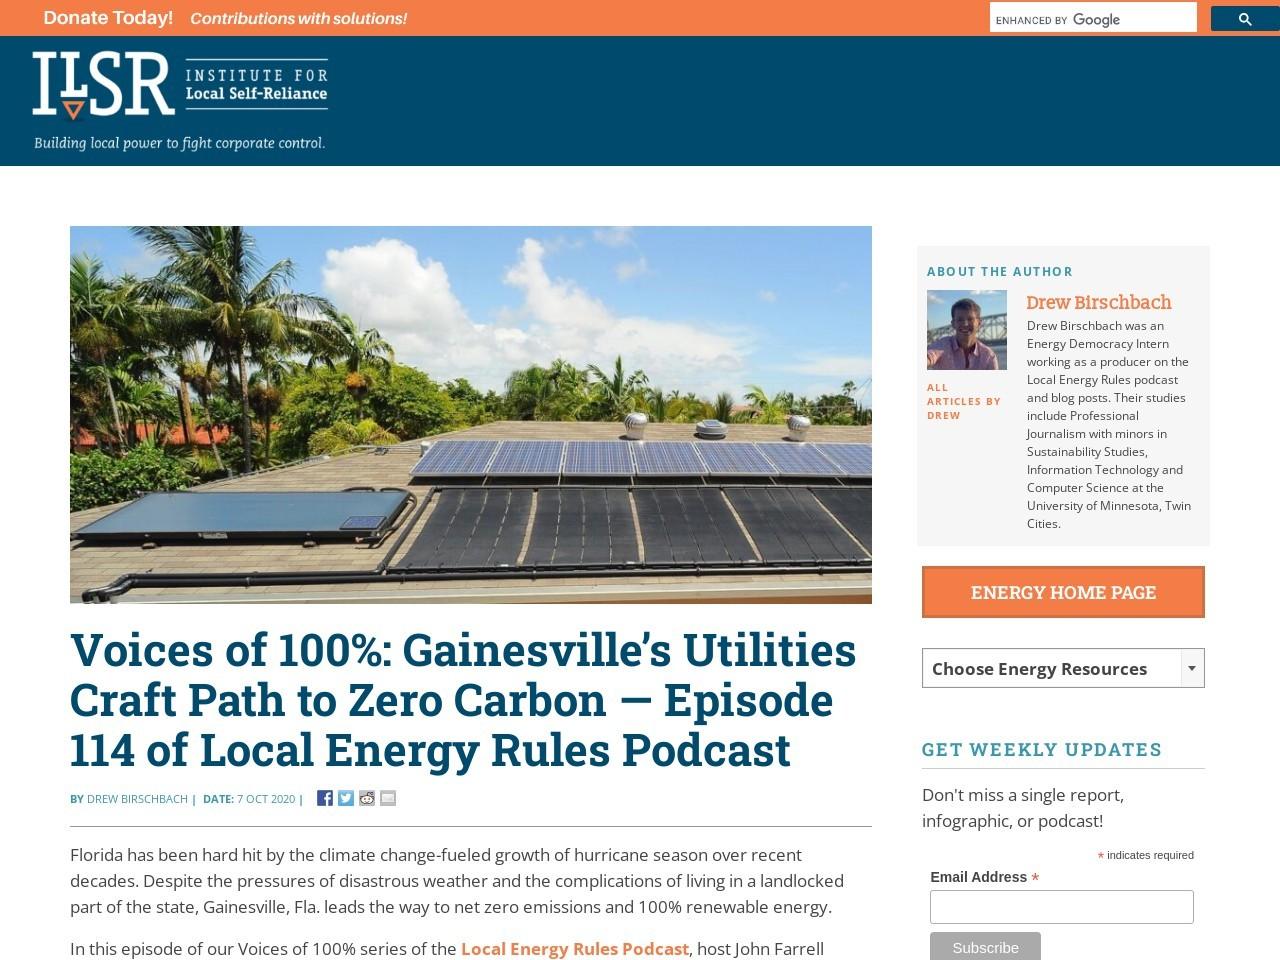 Voices of 100%: Gainesville's Utilities Craft Path to Zero Carbon